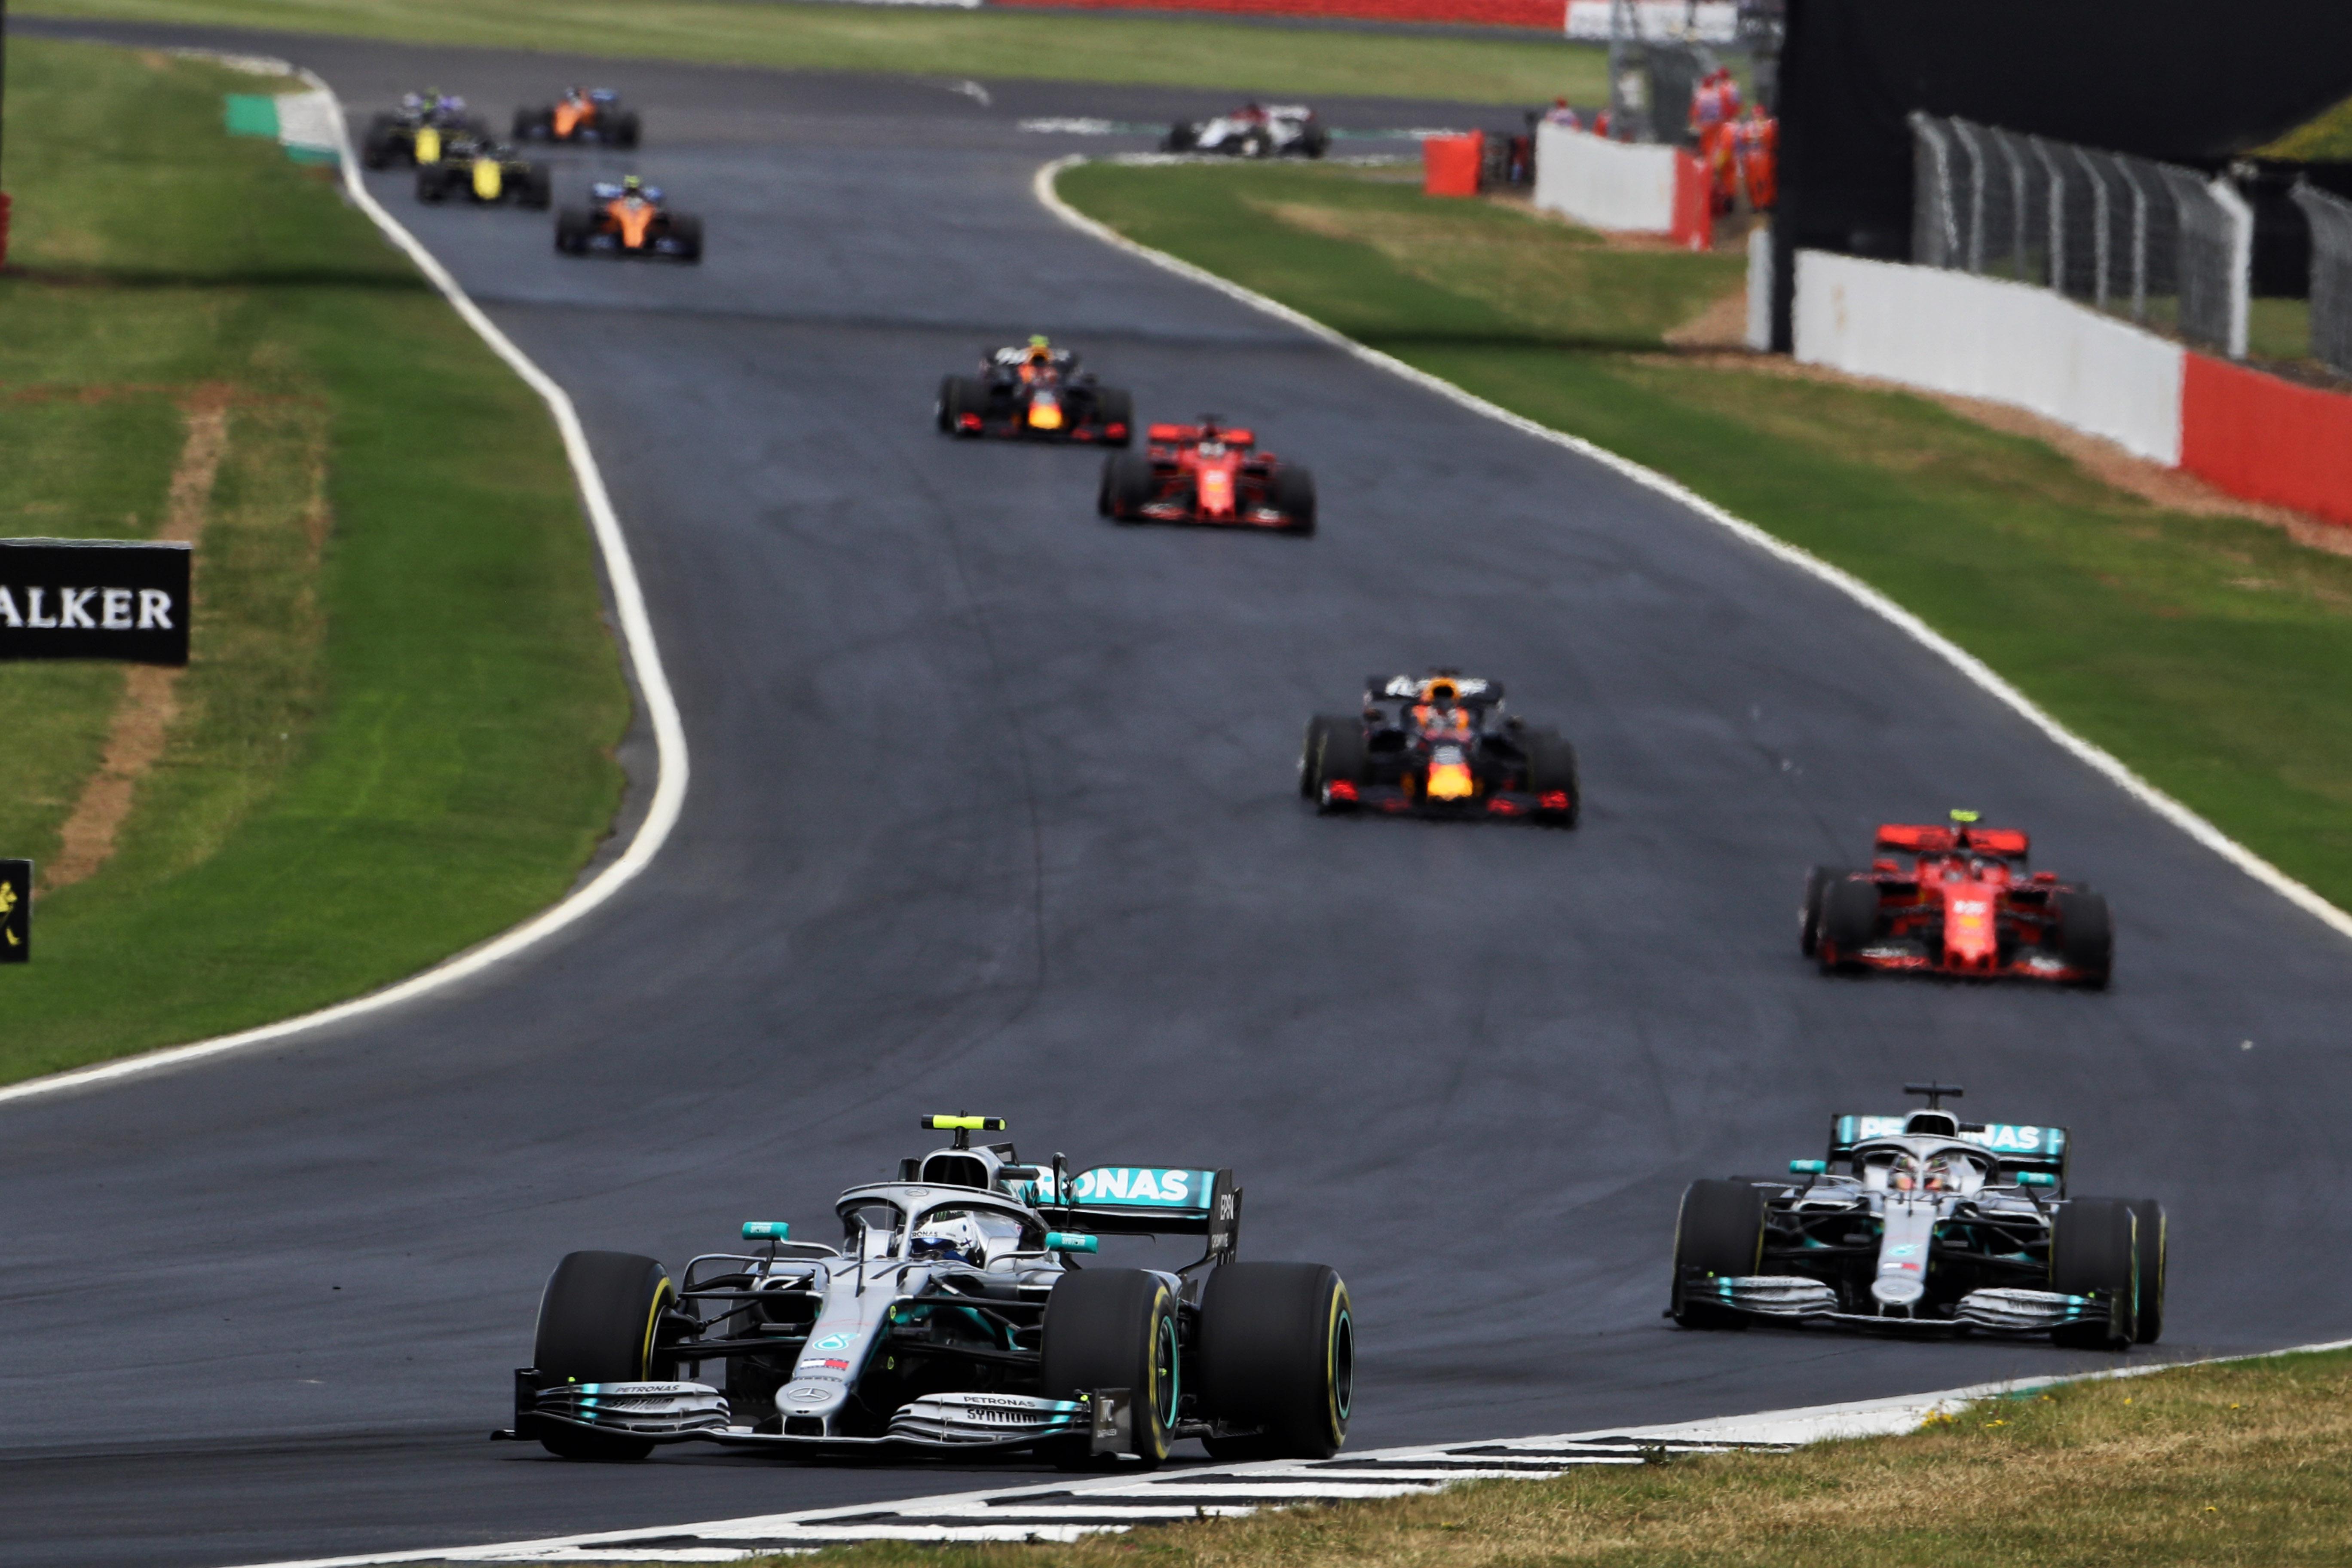 Motor Racing Formula One World Championship British Grand Prix Race Day Silverstone, England